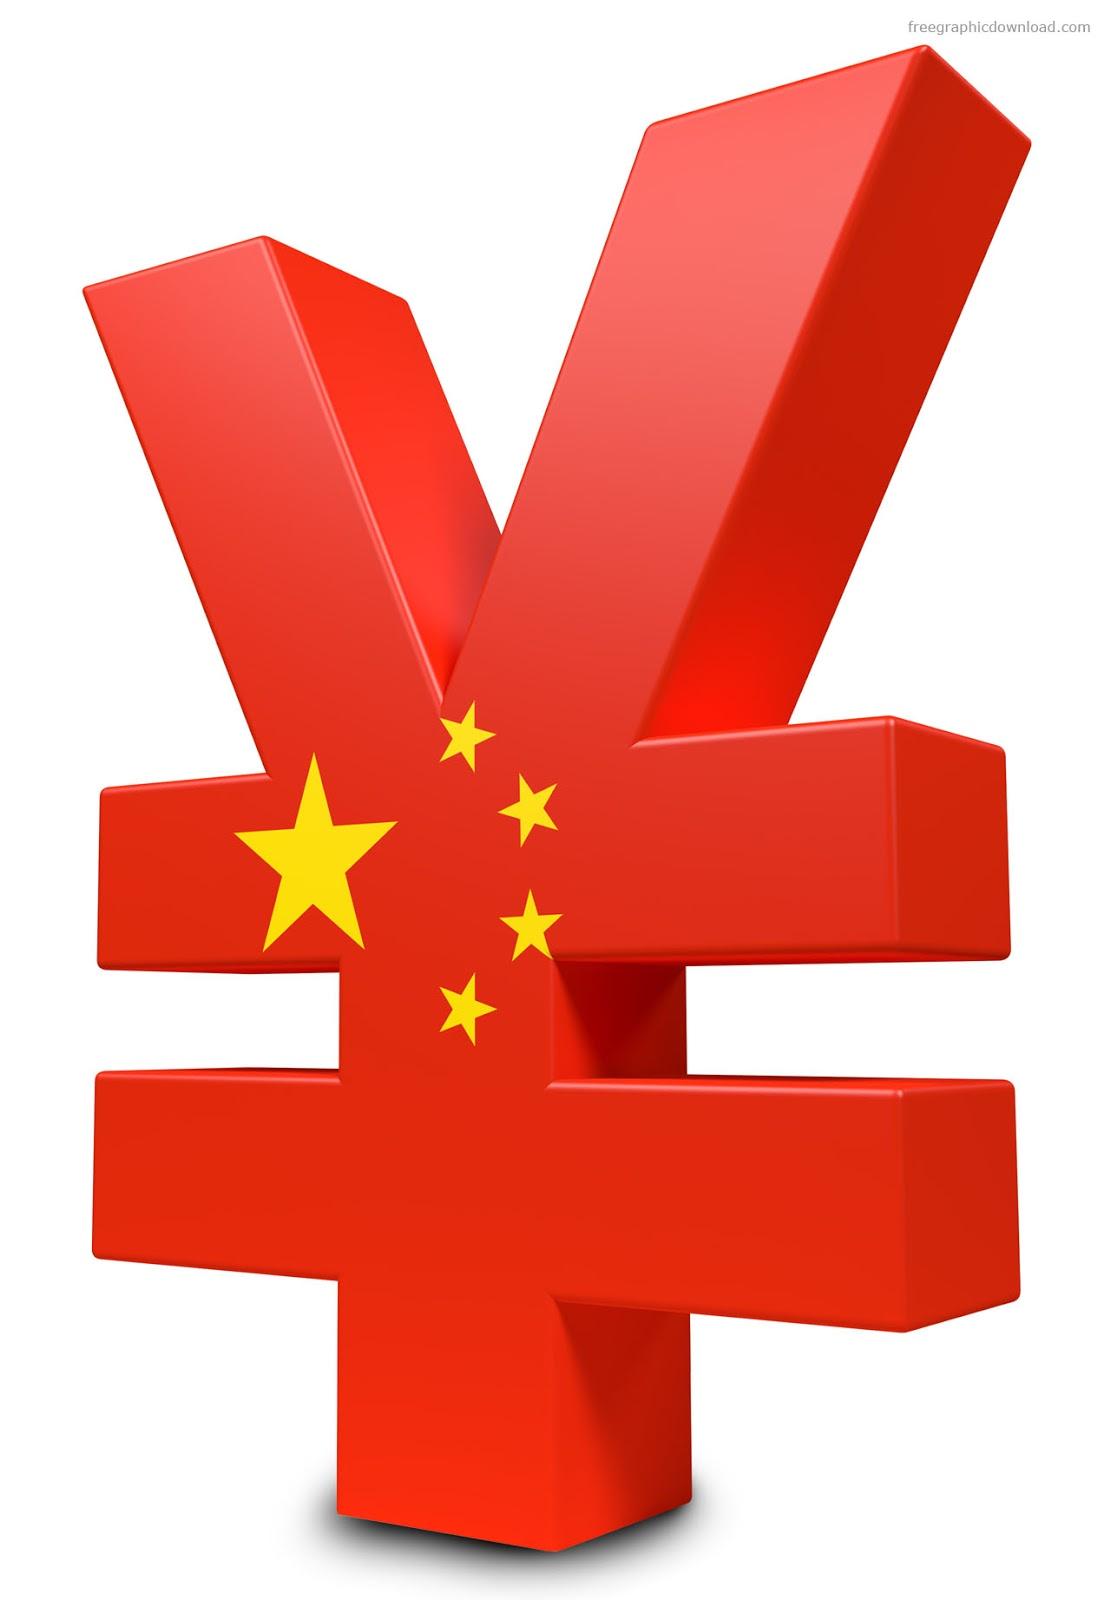 China foreign teachers union cftu minimum wage for foreign cftu minimum wage for foreign teachers in china must keep pace biocorpaavc Gallery